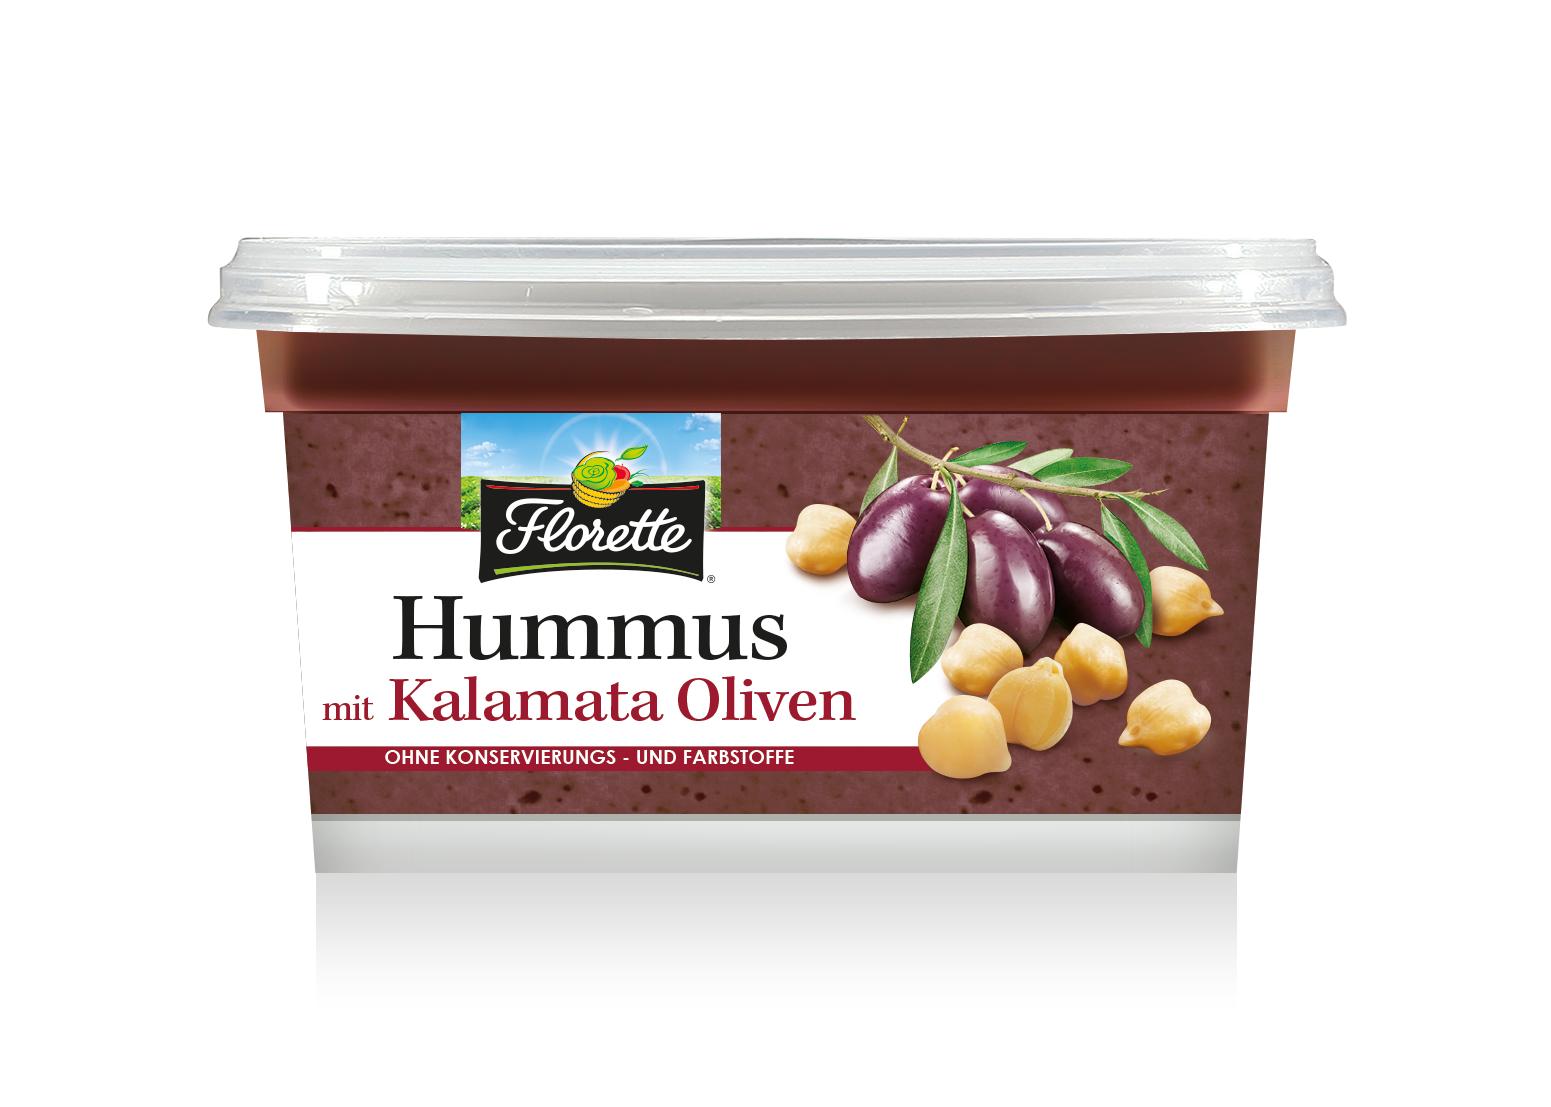 Hummus mit Kalamata Oliven 3D HD